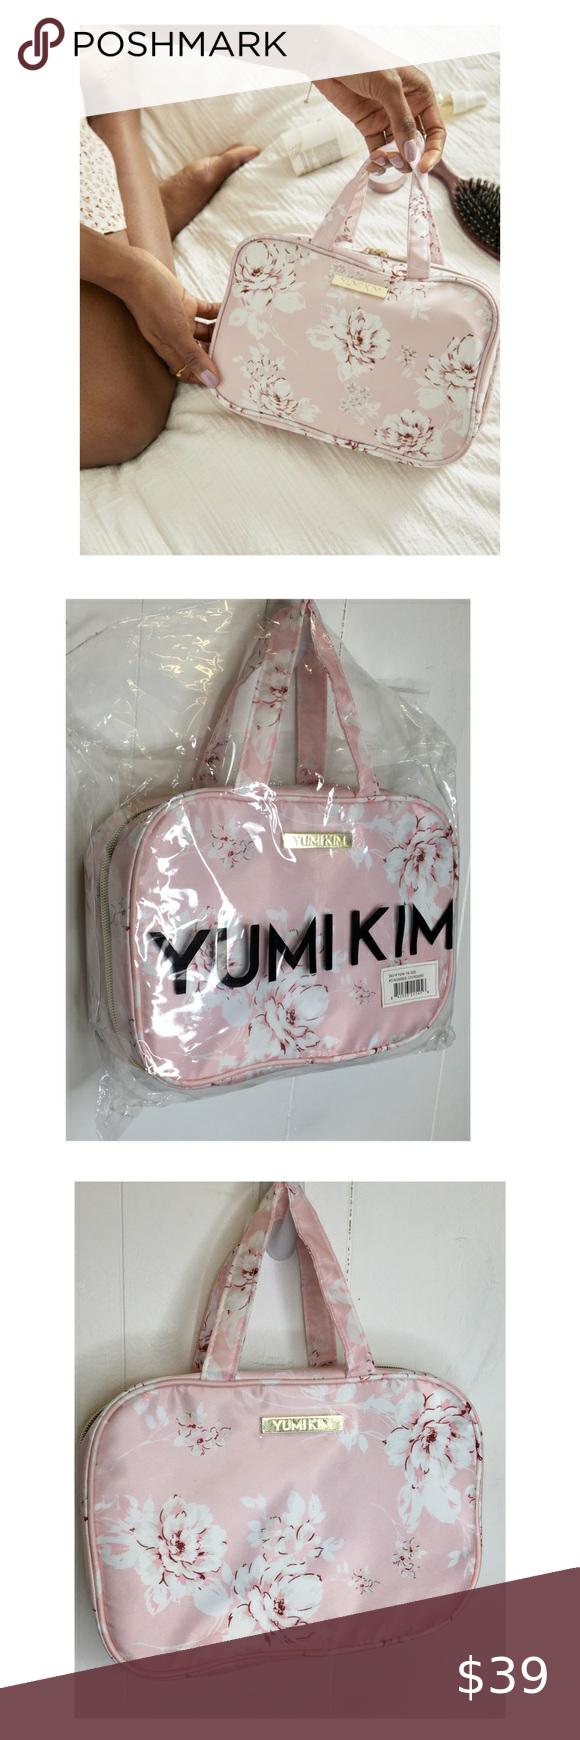 YUMI KIM NWT Wanderlust Makeup Travel Case Pink NWT in